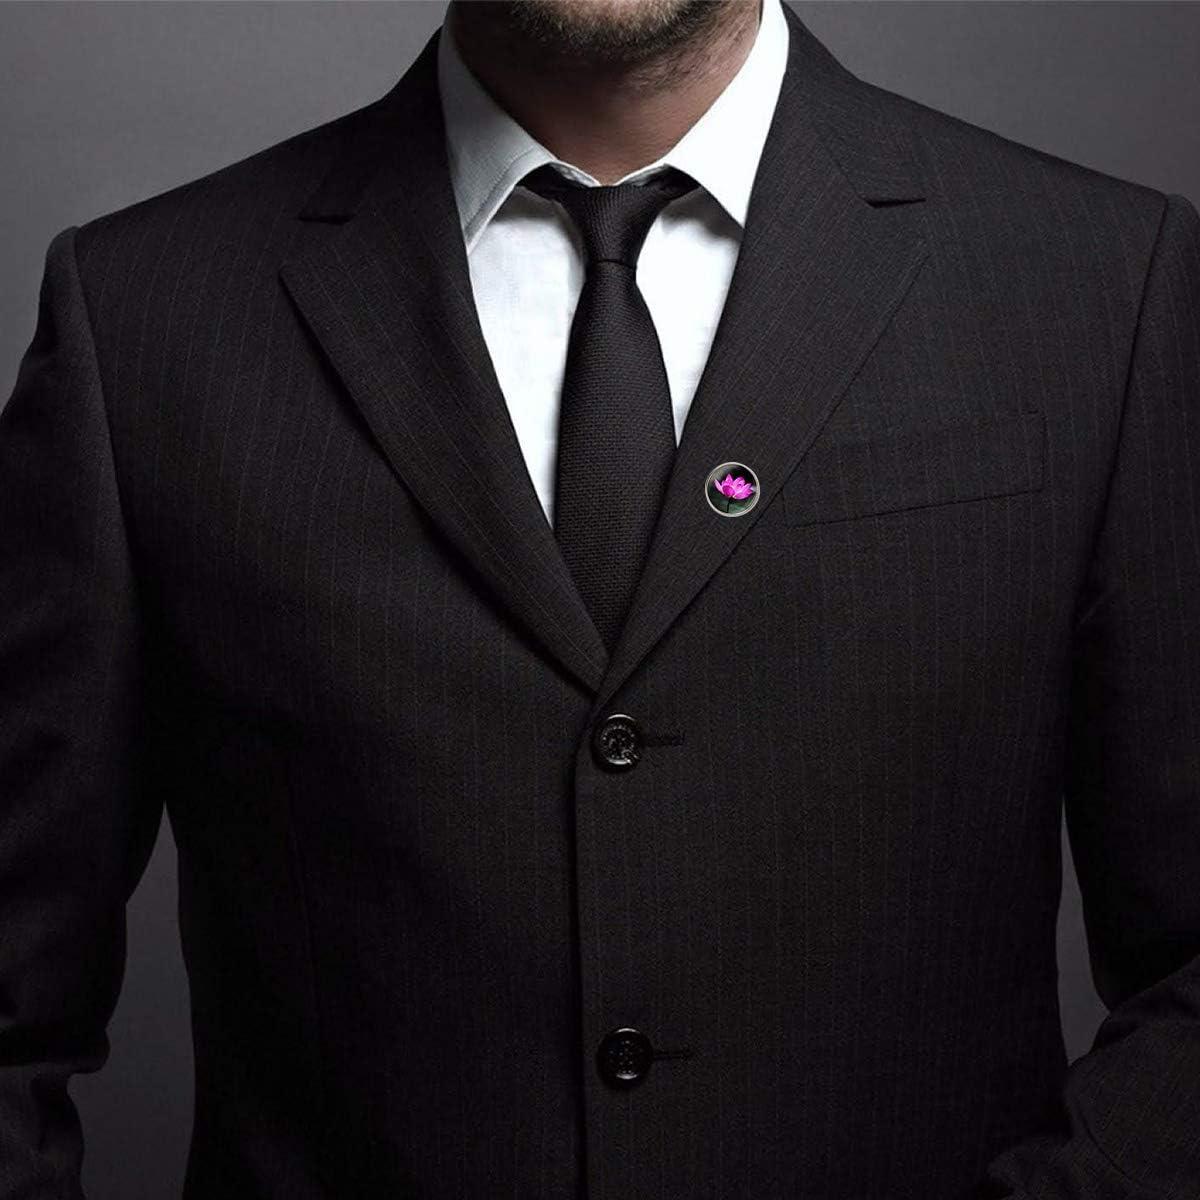 Custom Lapel Pin Brooches Purple Summer Art Lotus Banquet Badge Pins Trendy Accessory Jacket T-Shirt Bag Hat Shoe